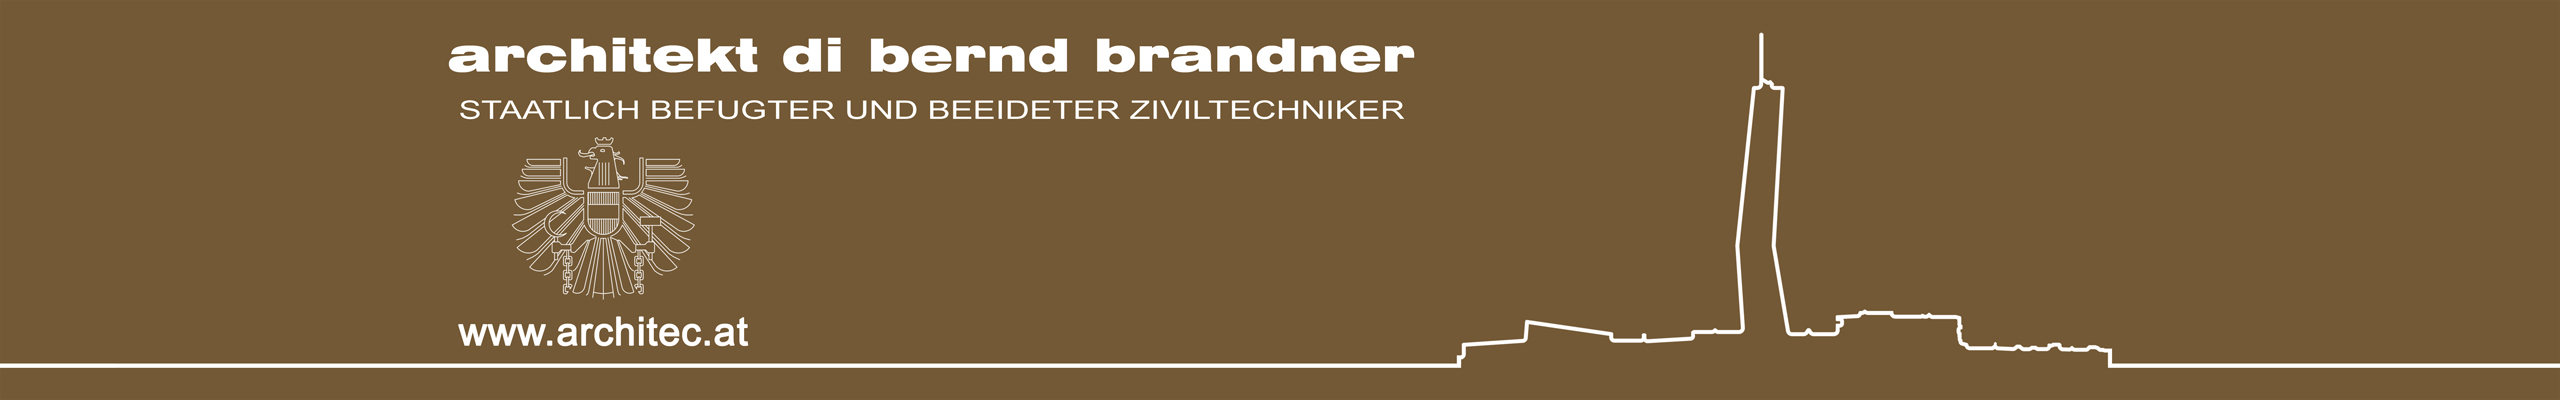 Architekt DI Bernd Brandner